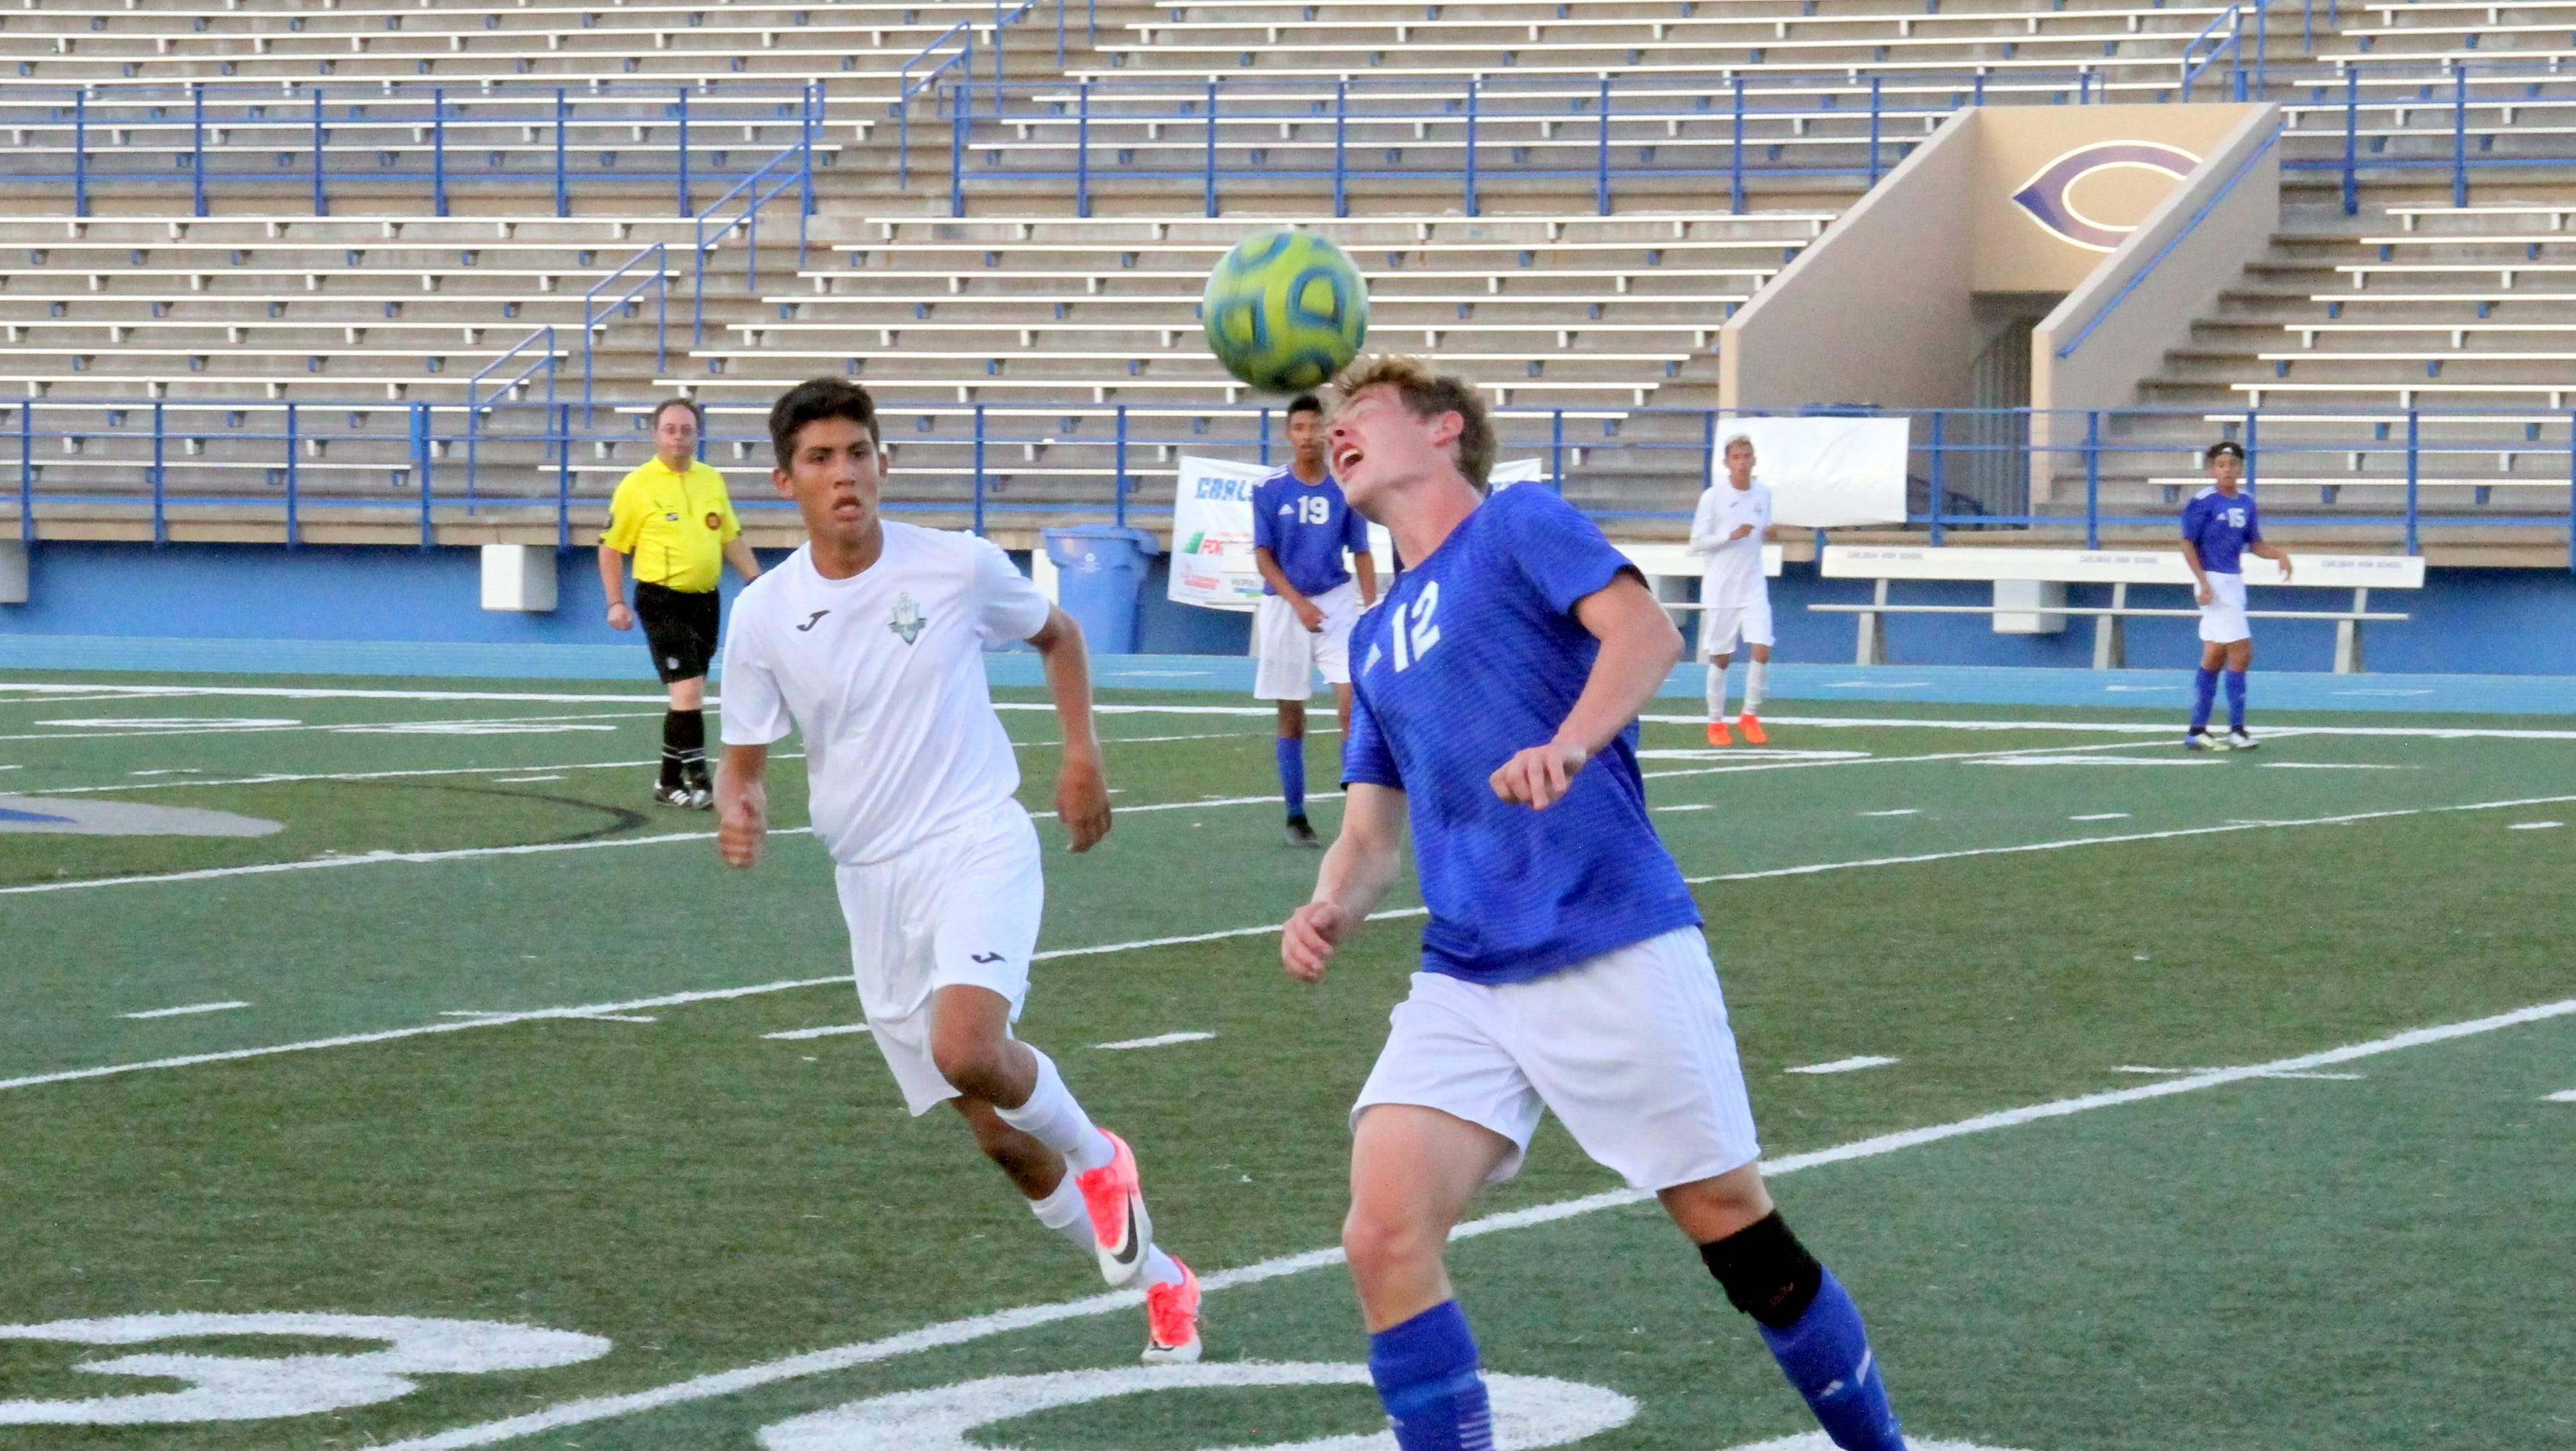 Weston Rhoades heads a ball during the first half of Tuesday's match against Santa Teresa.